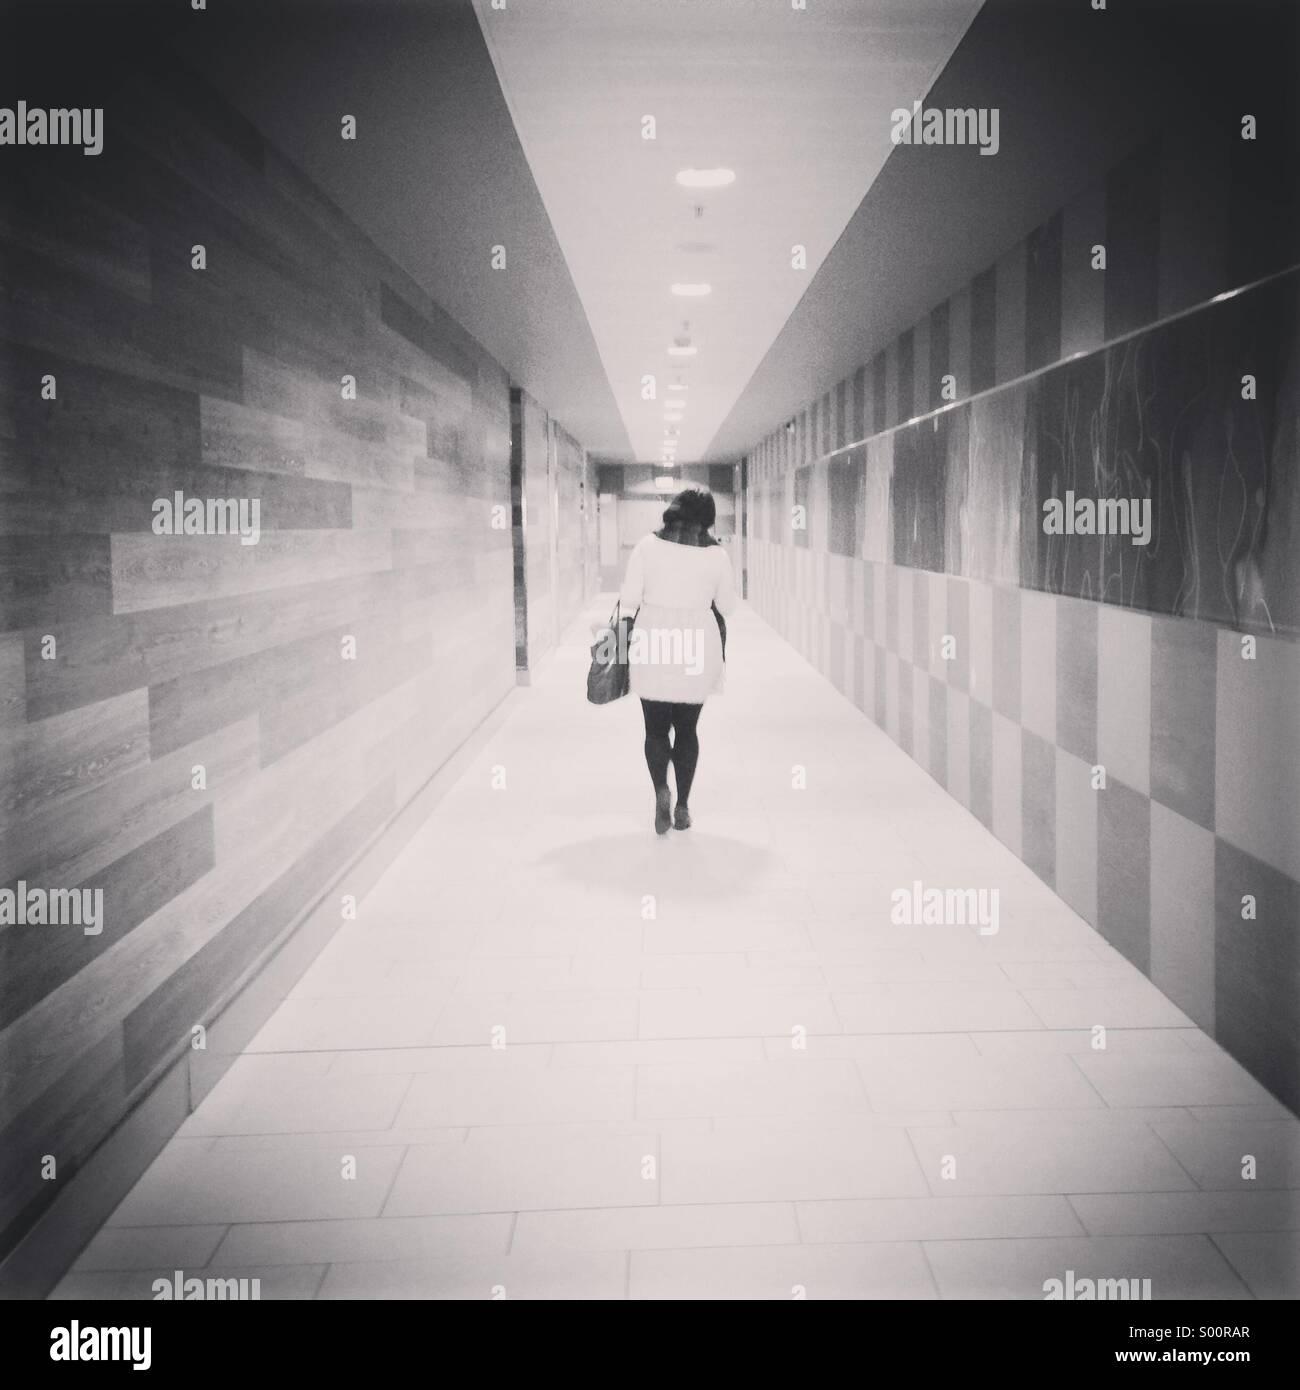 Corridor - Stock Image